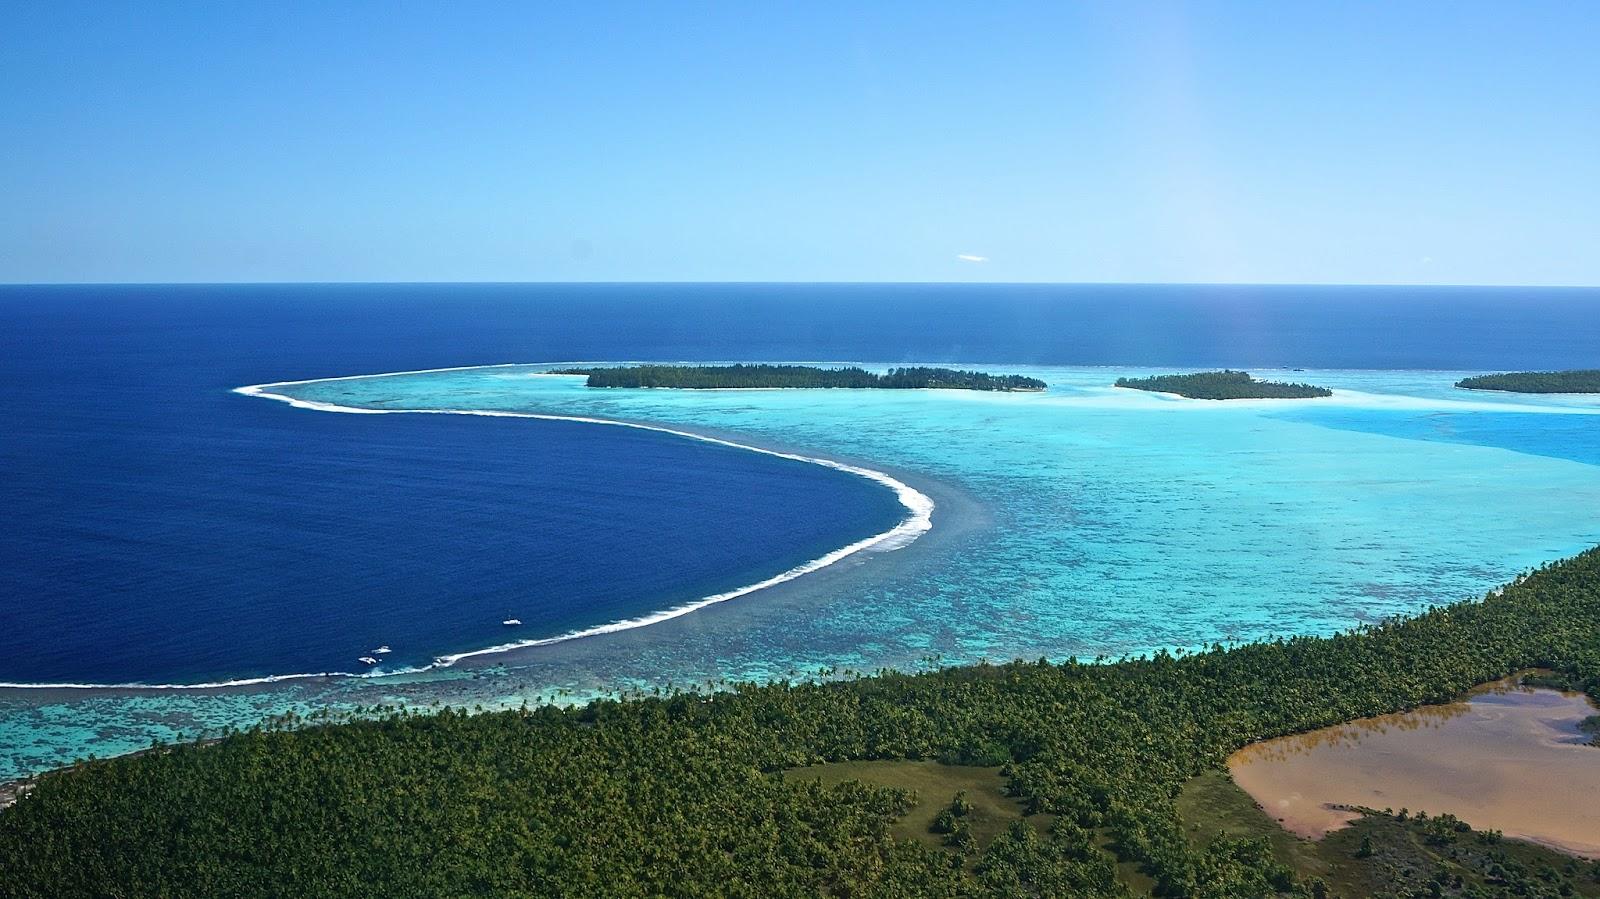 Tahiti moorea Tetiaroa from the sky flying over island and atoll French polynesia www.lexieblush.co.uk